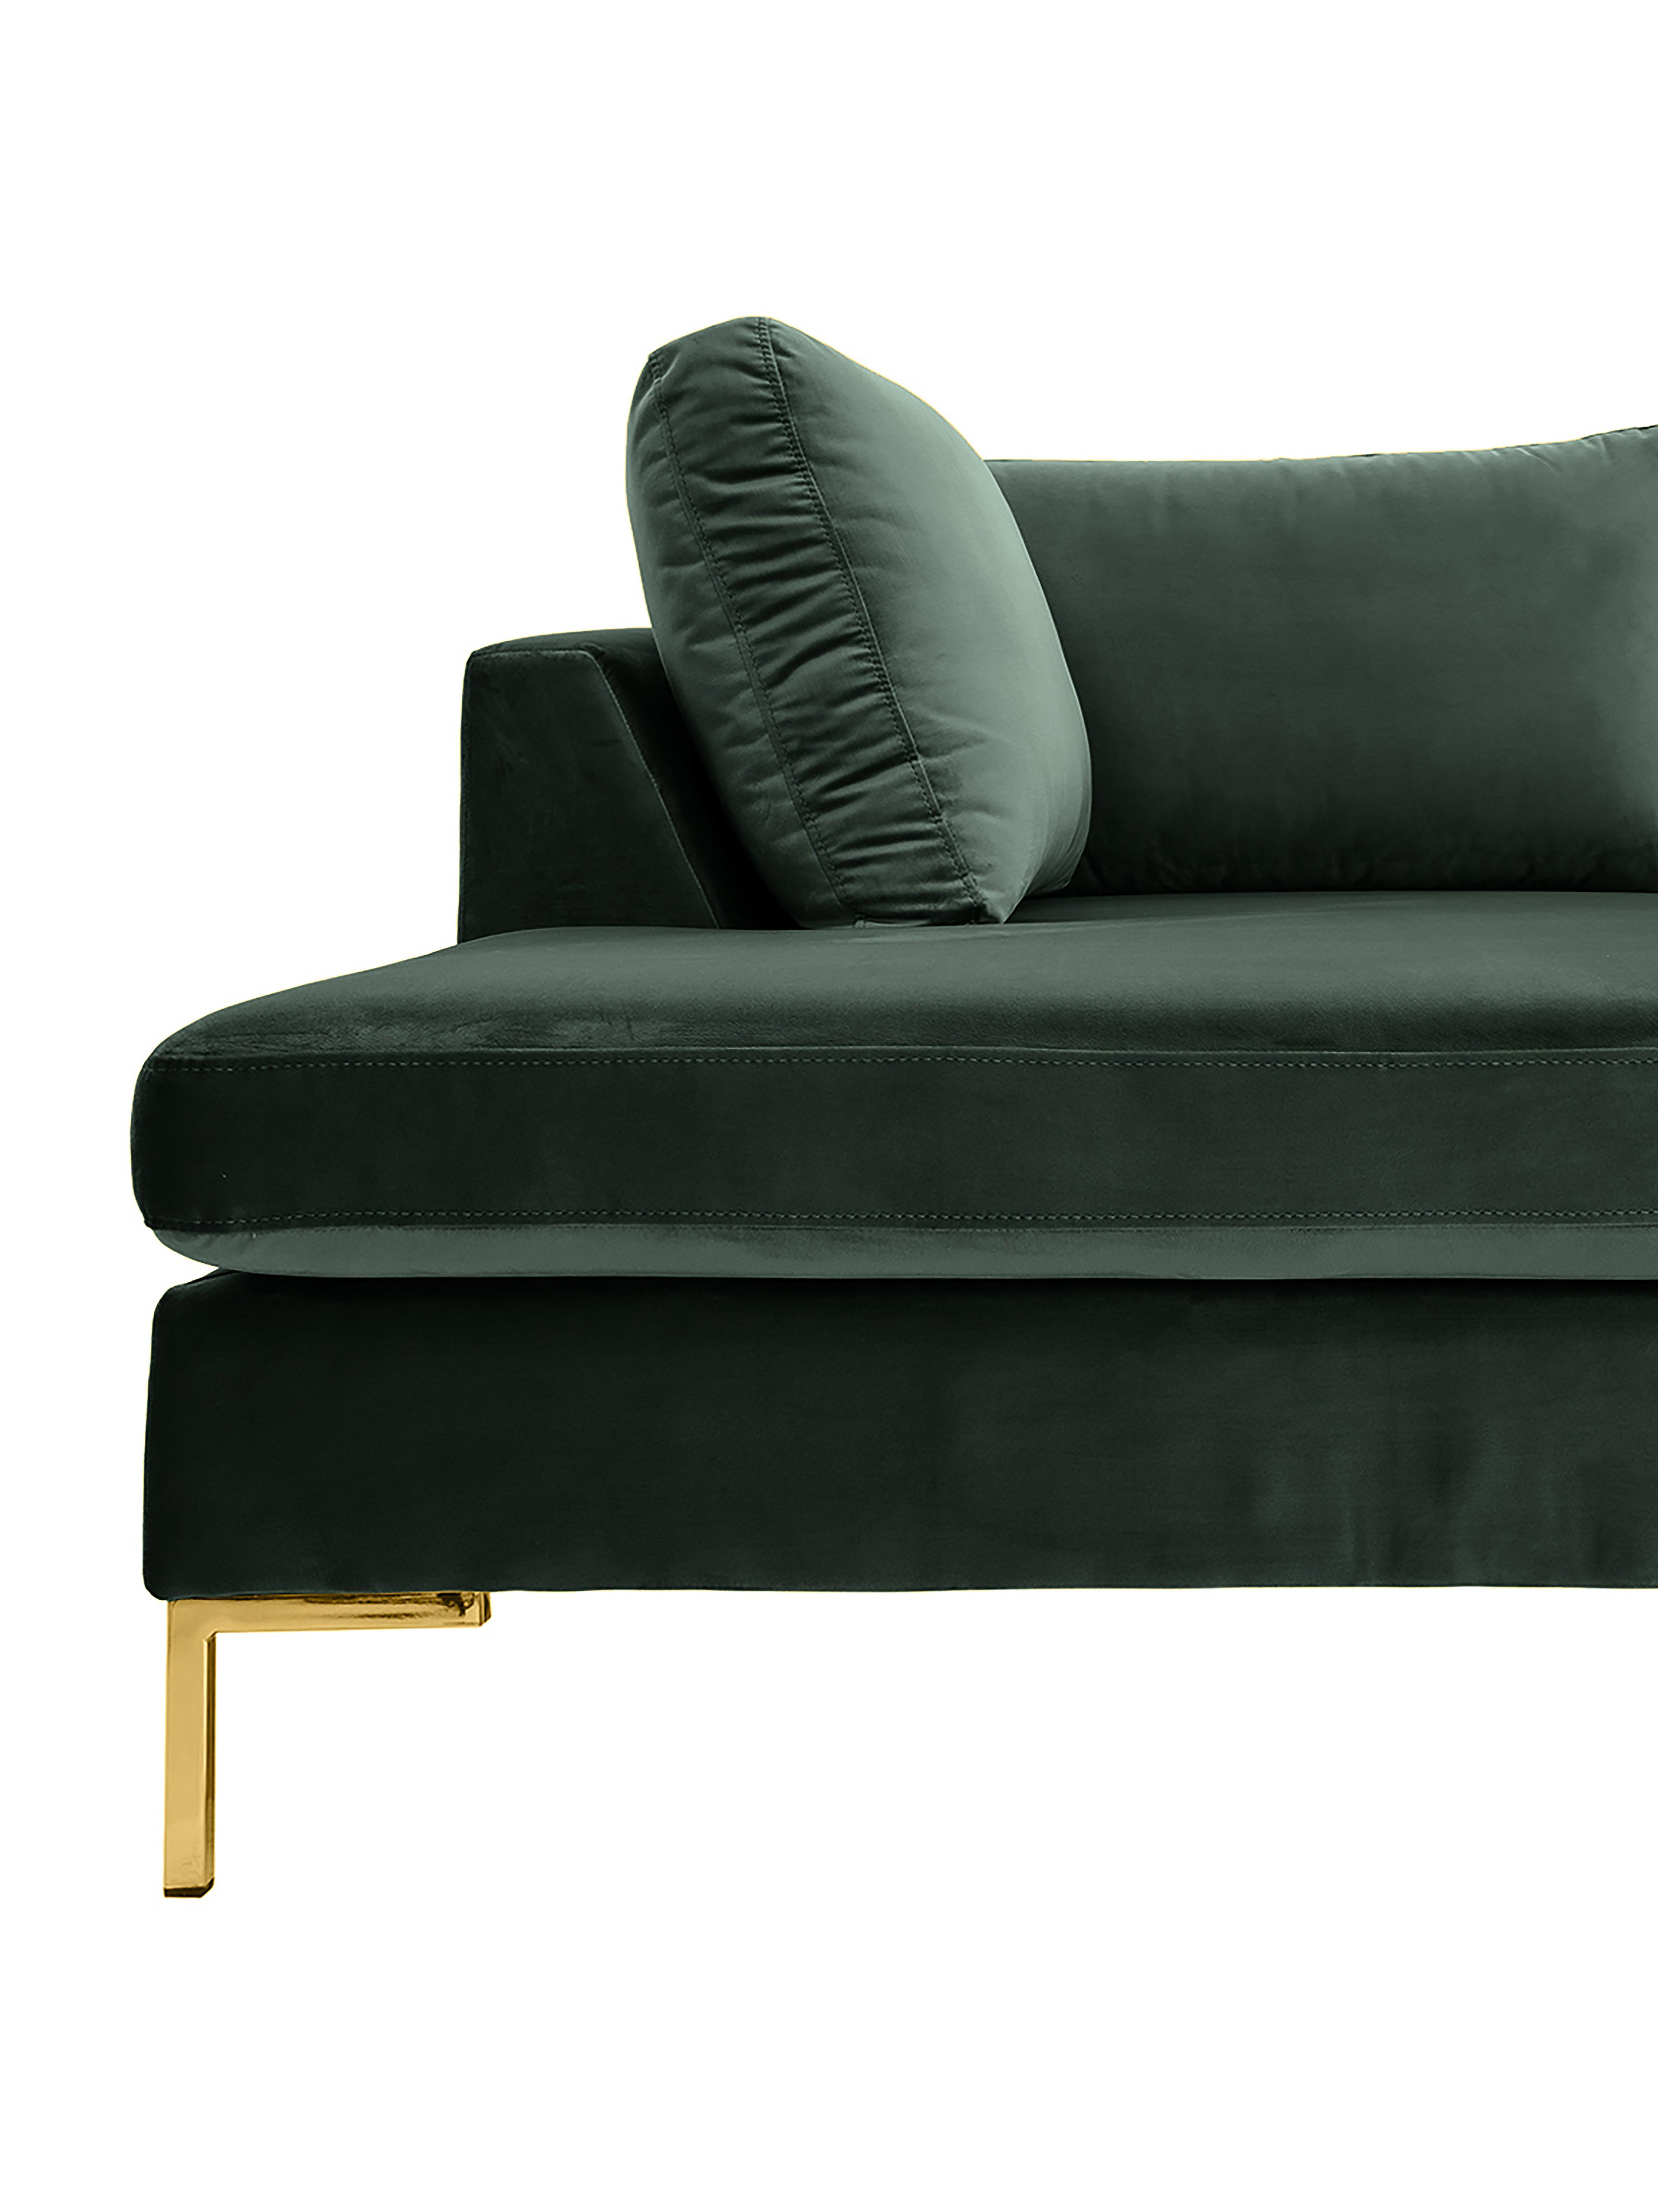 Samt-Ecksofa Luna, Bezug: Samt (Polyester) Der hoch, Gestell: Massives Buchenholz, Samt Dunkelgrün, Gold, B 280 x T 184 cm